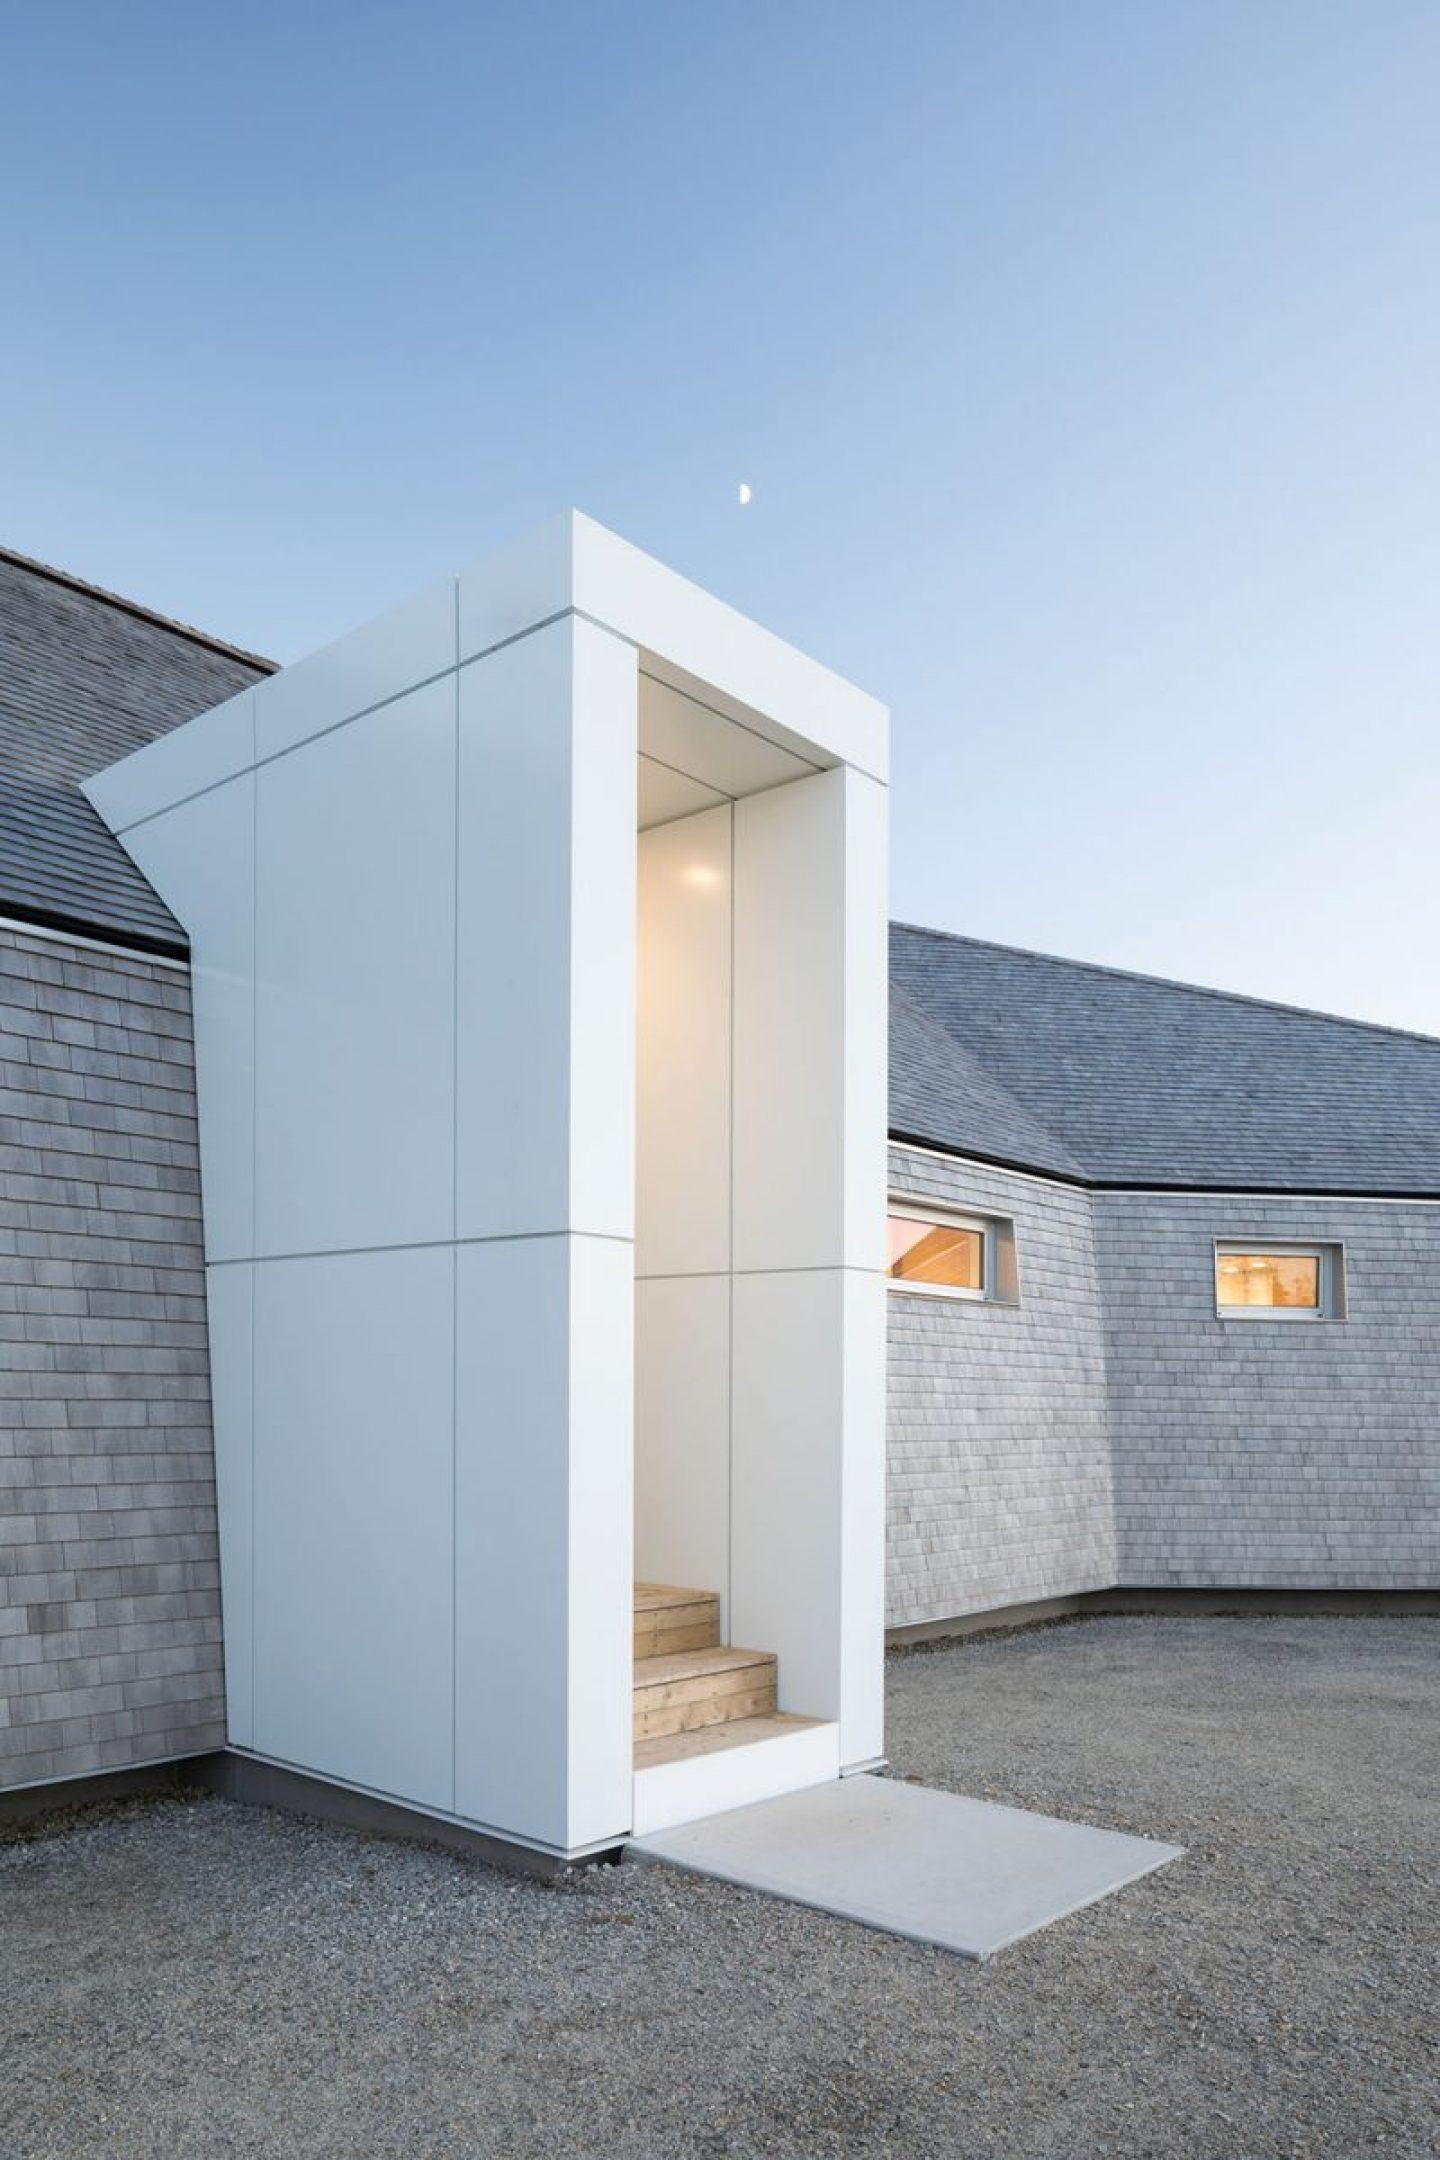 iGNANT_Architecture_Sluice_Point_House_Omar_Gandhi_Architect_4